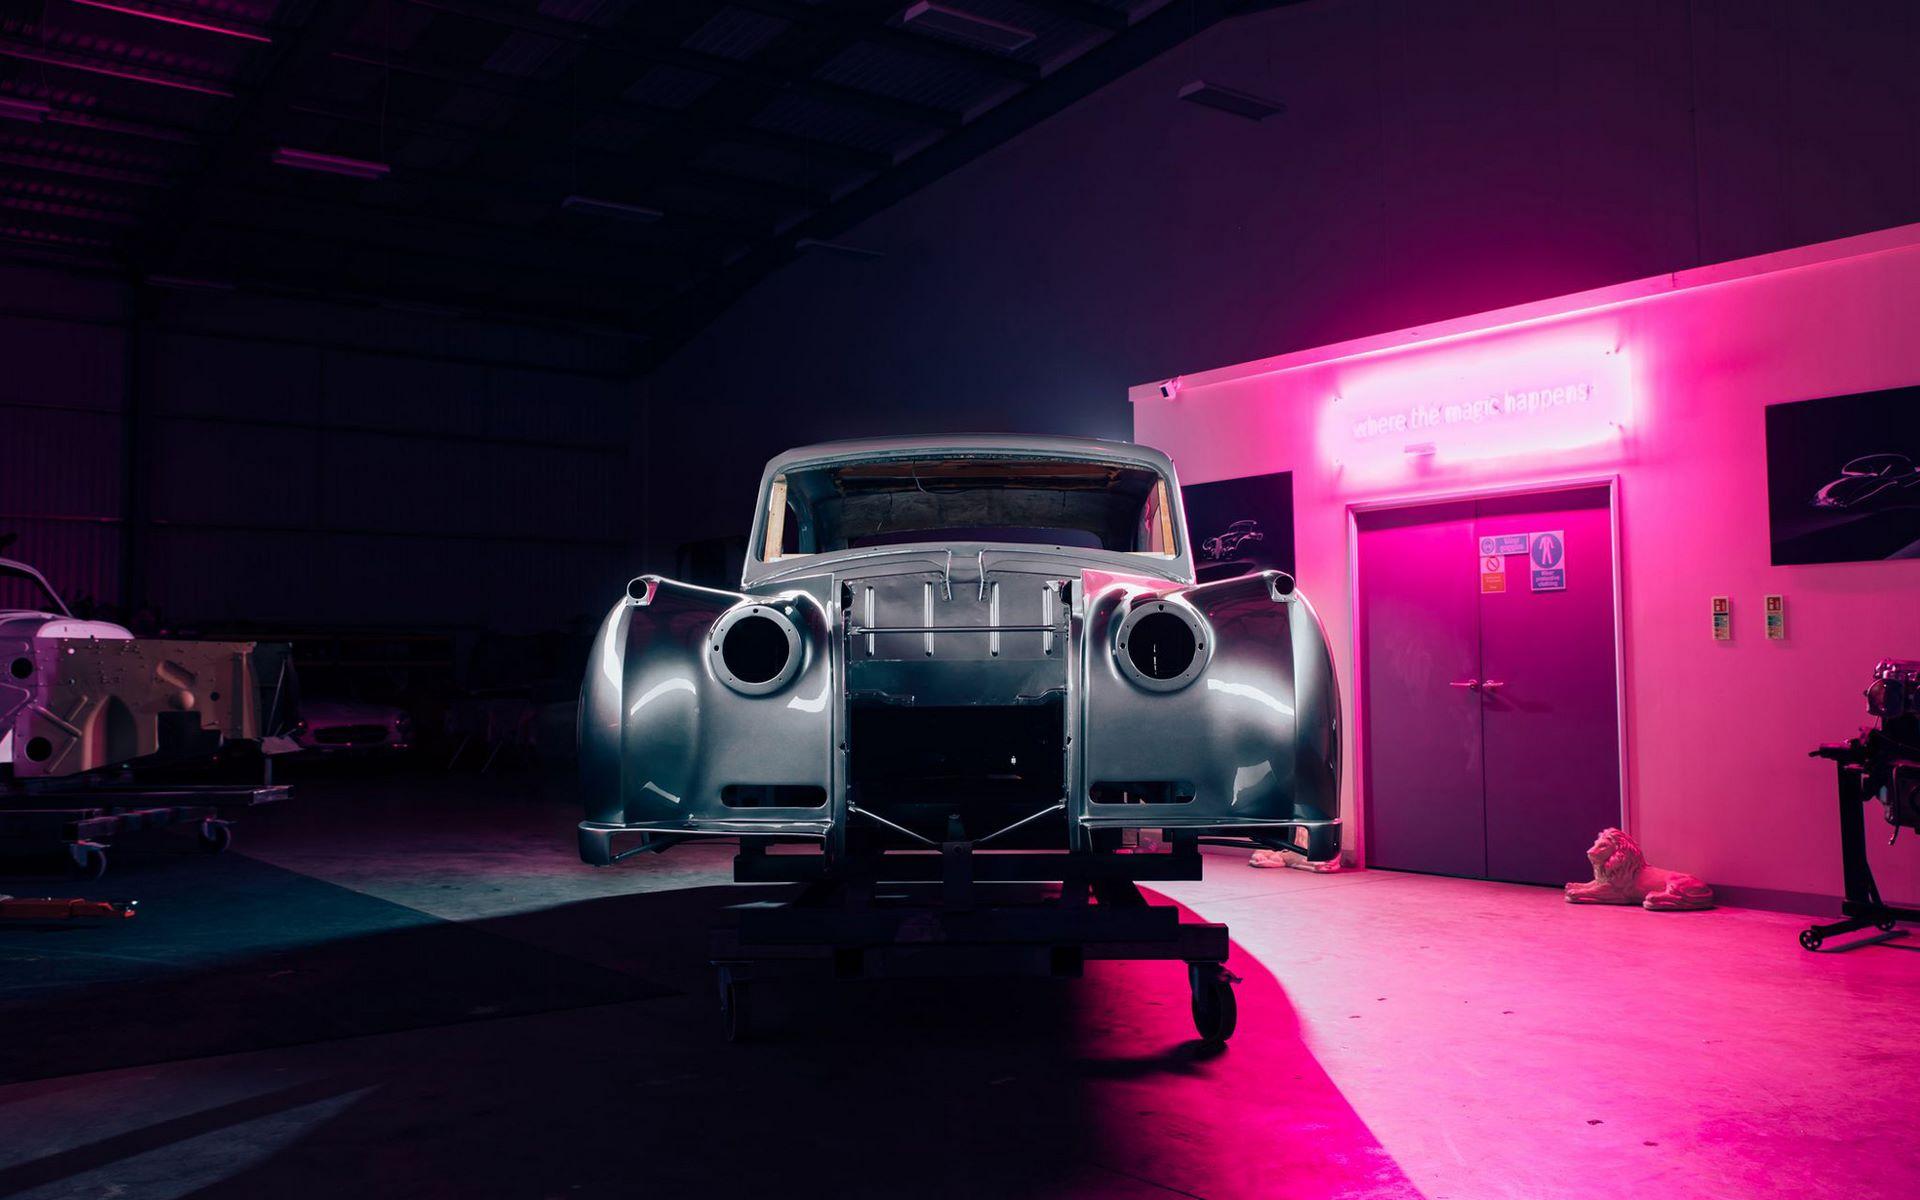 Electris-Rolls-Royce-Phantom-V-and-Silver-Cloud-by-Lunaz-27